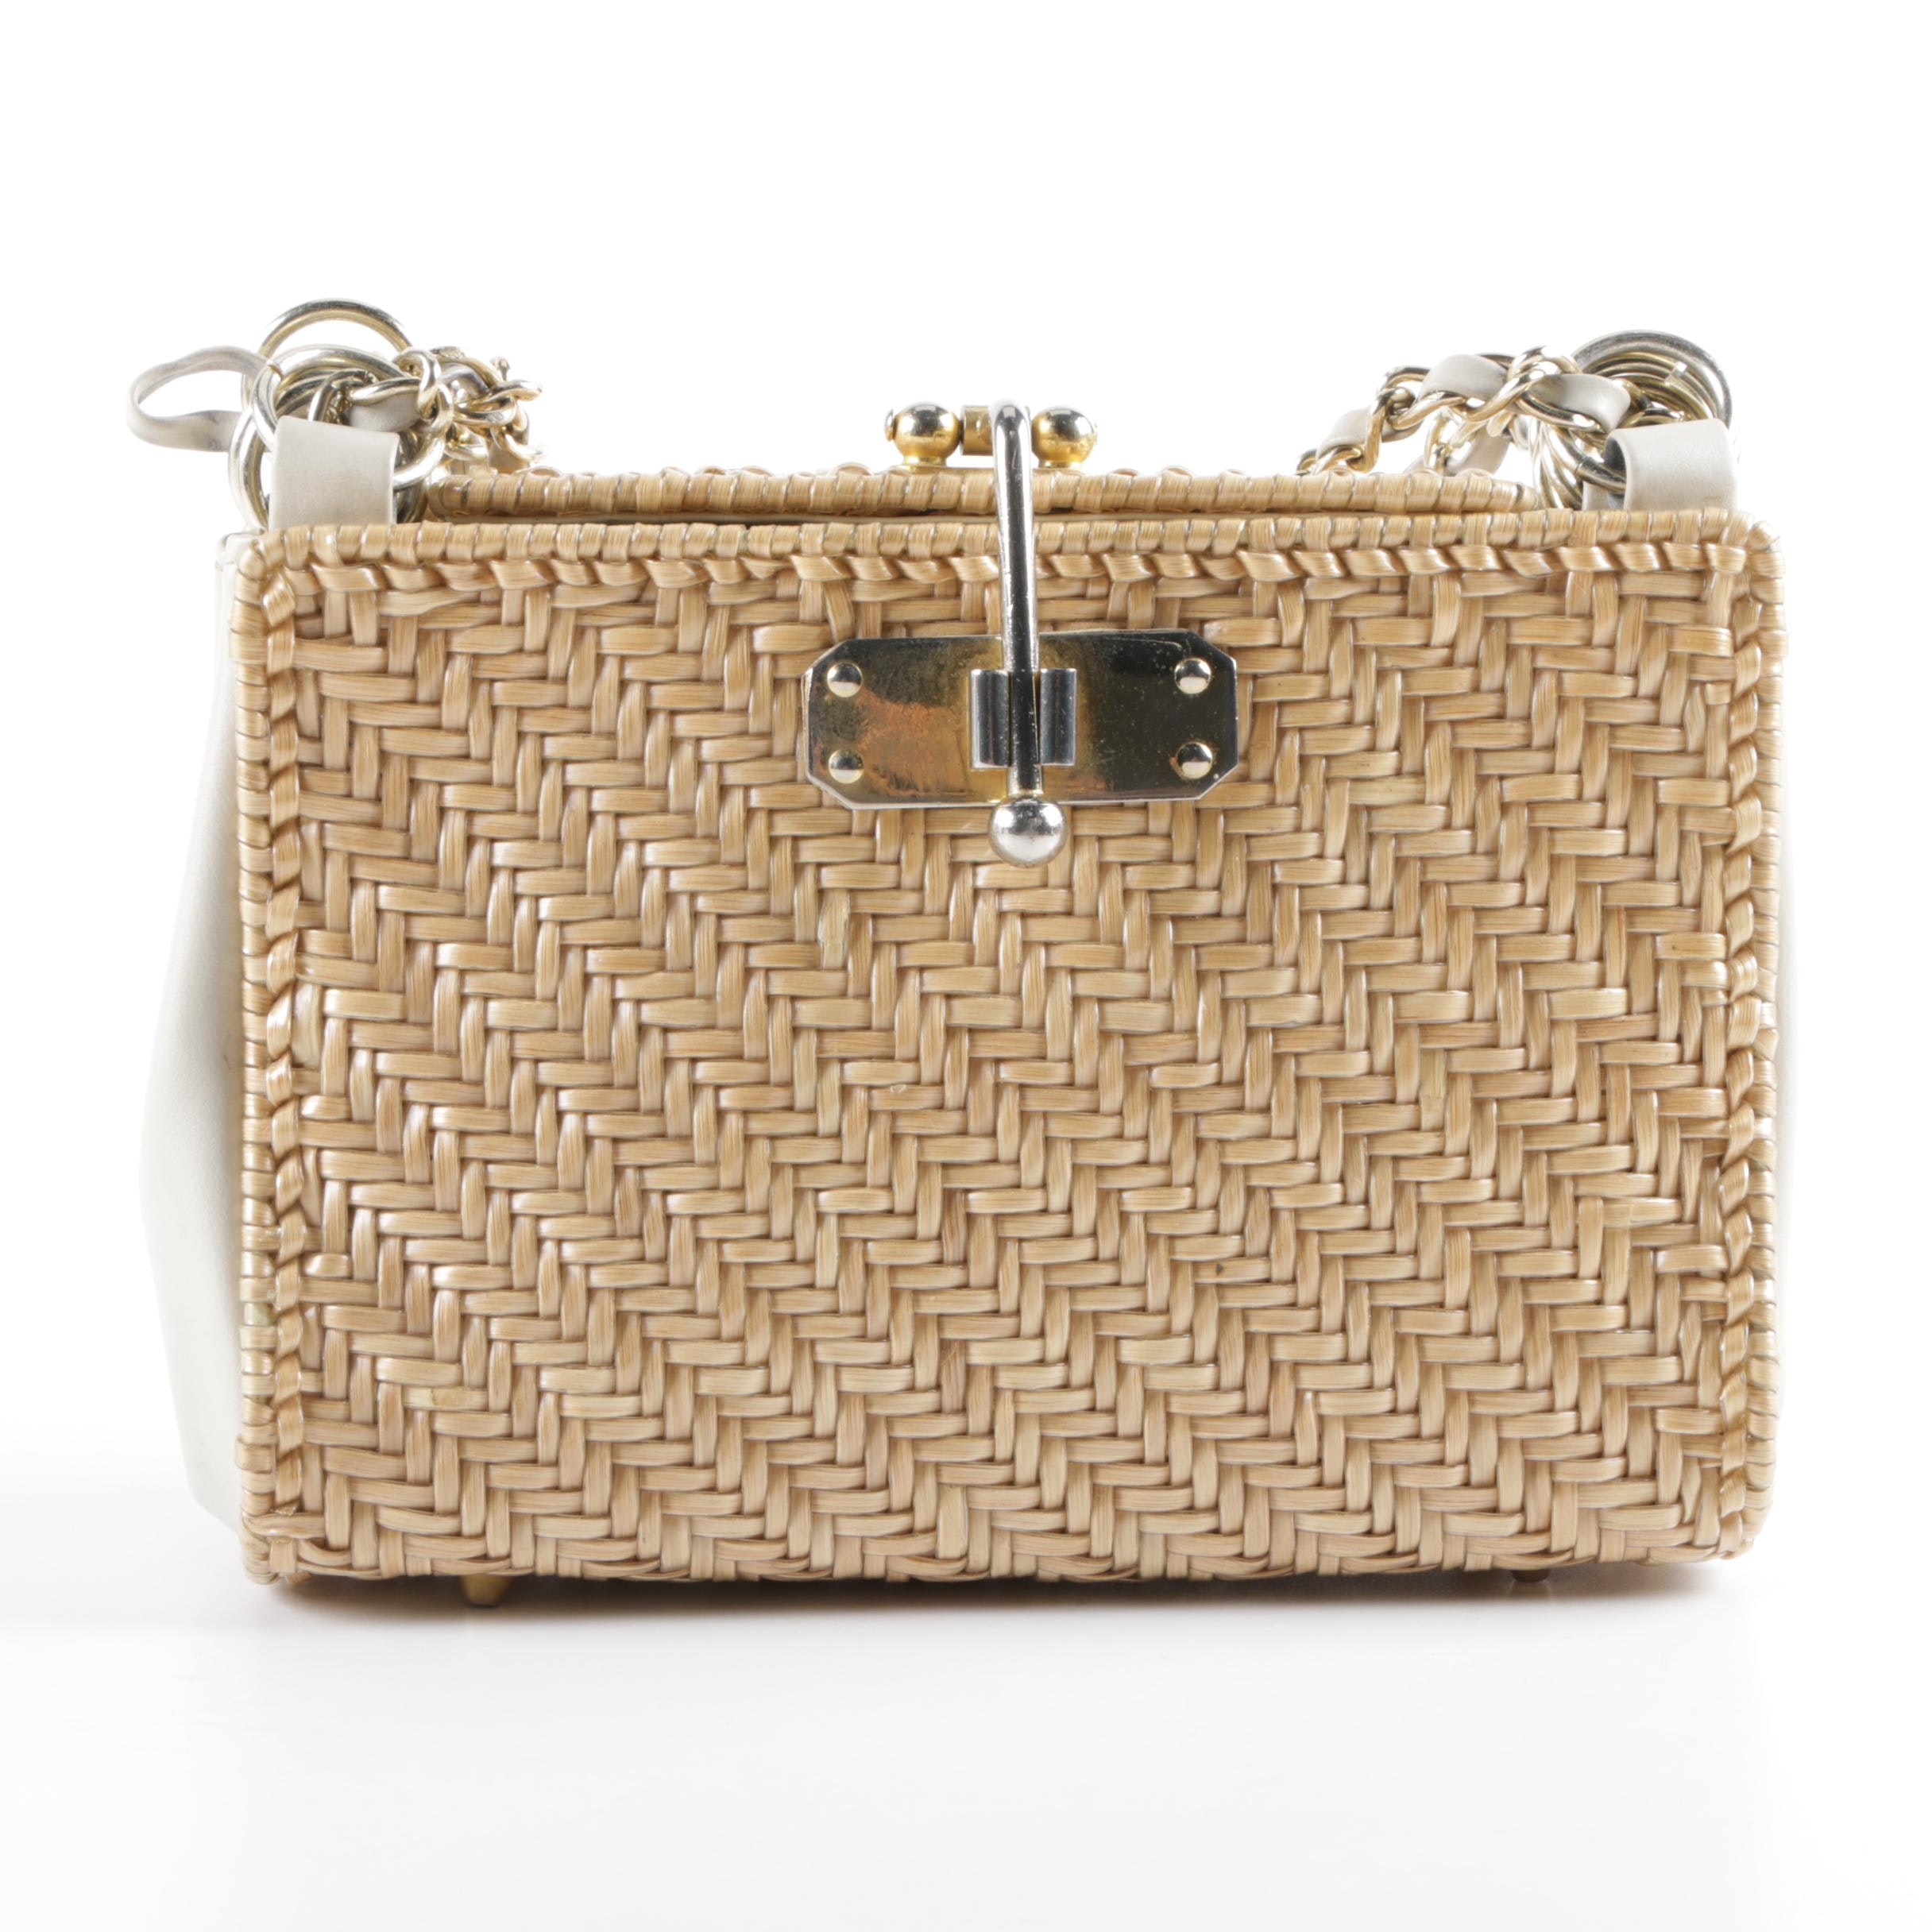 1960s Vintage Lesco Lona Woven Handbag